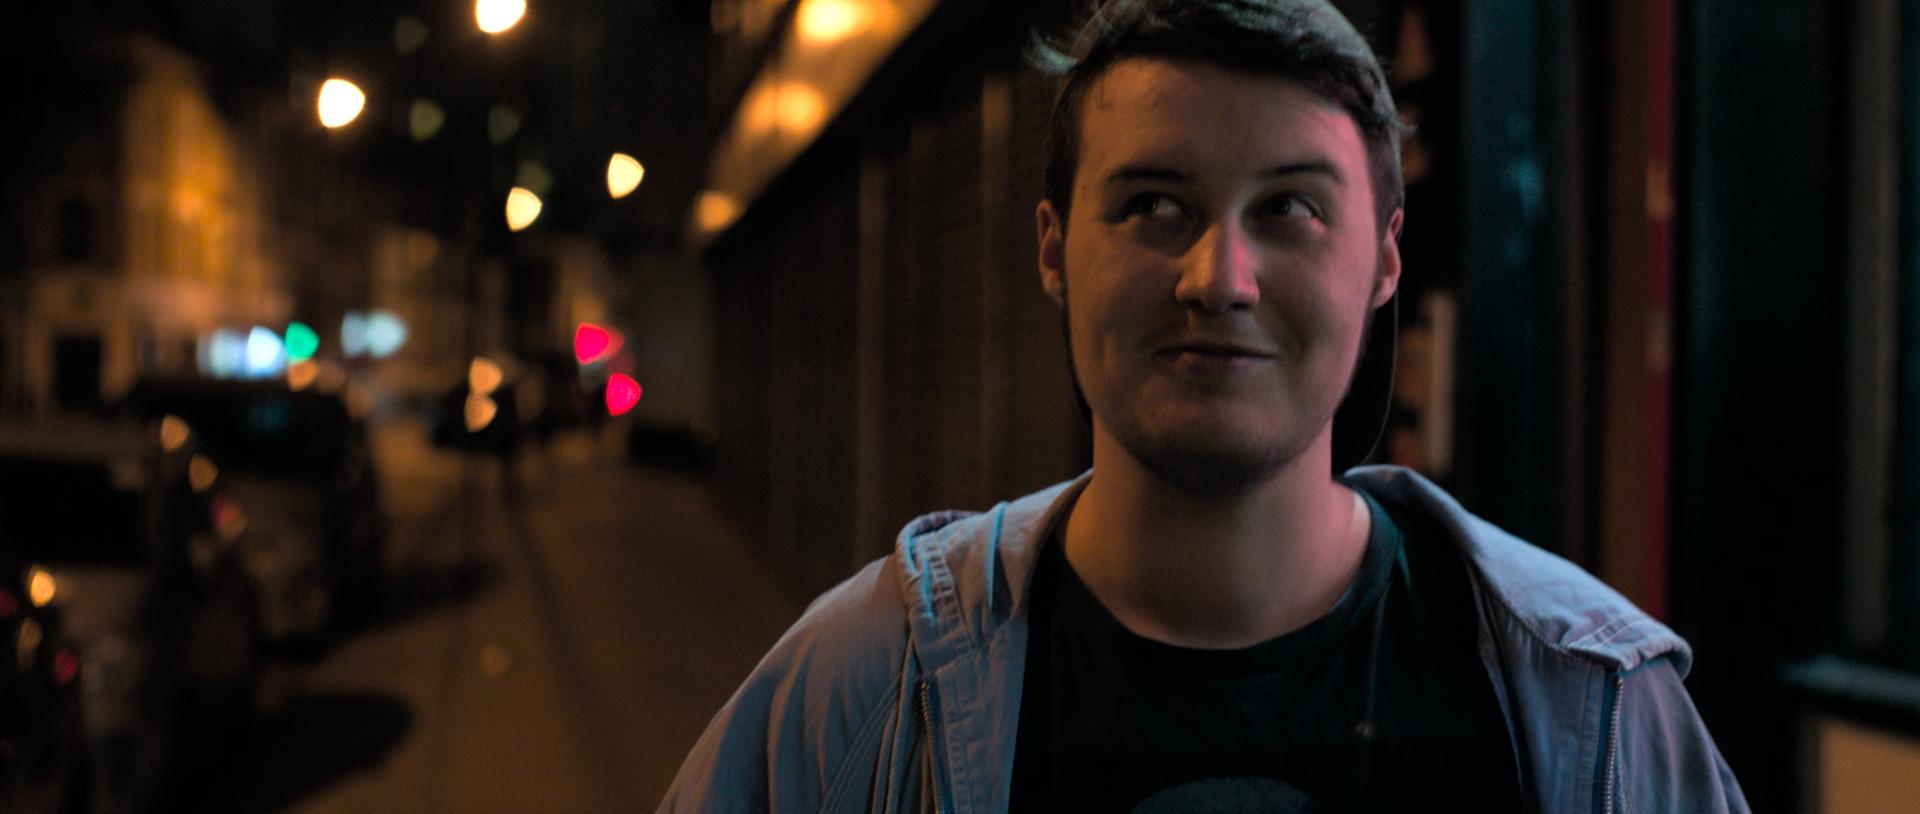 Ink Asher Hemp as Orin on the street at night